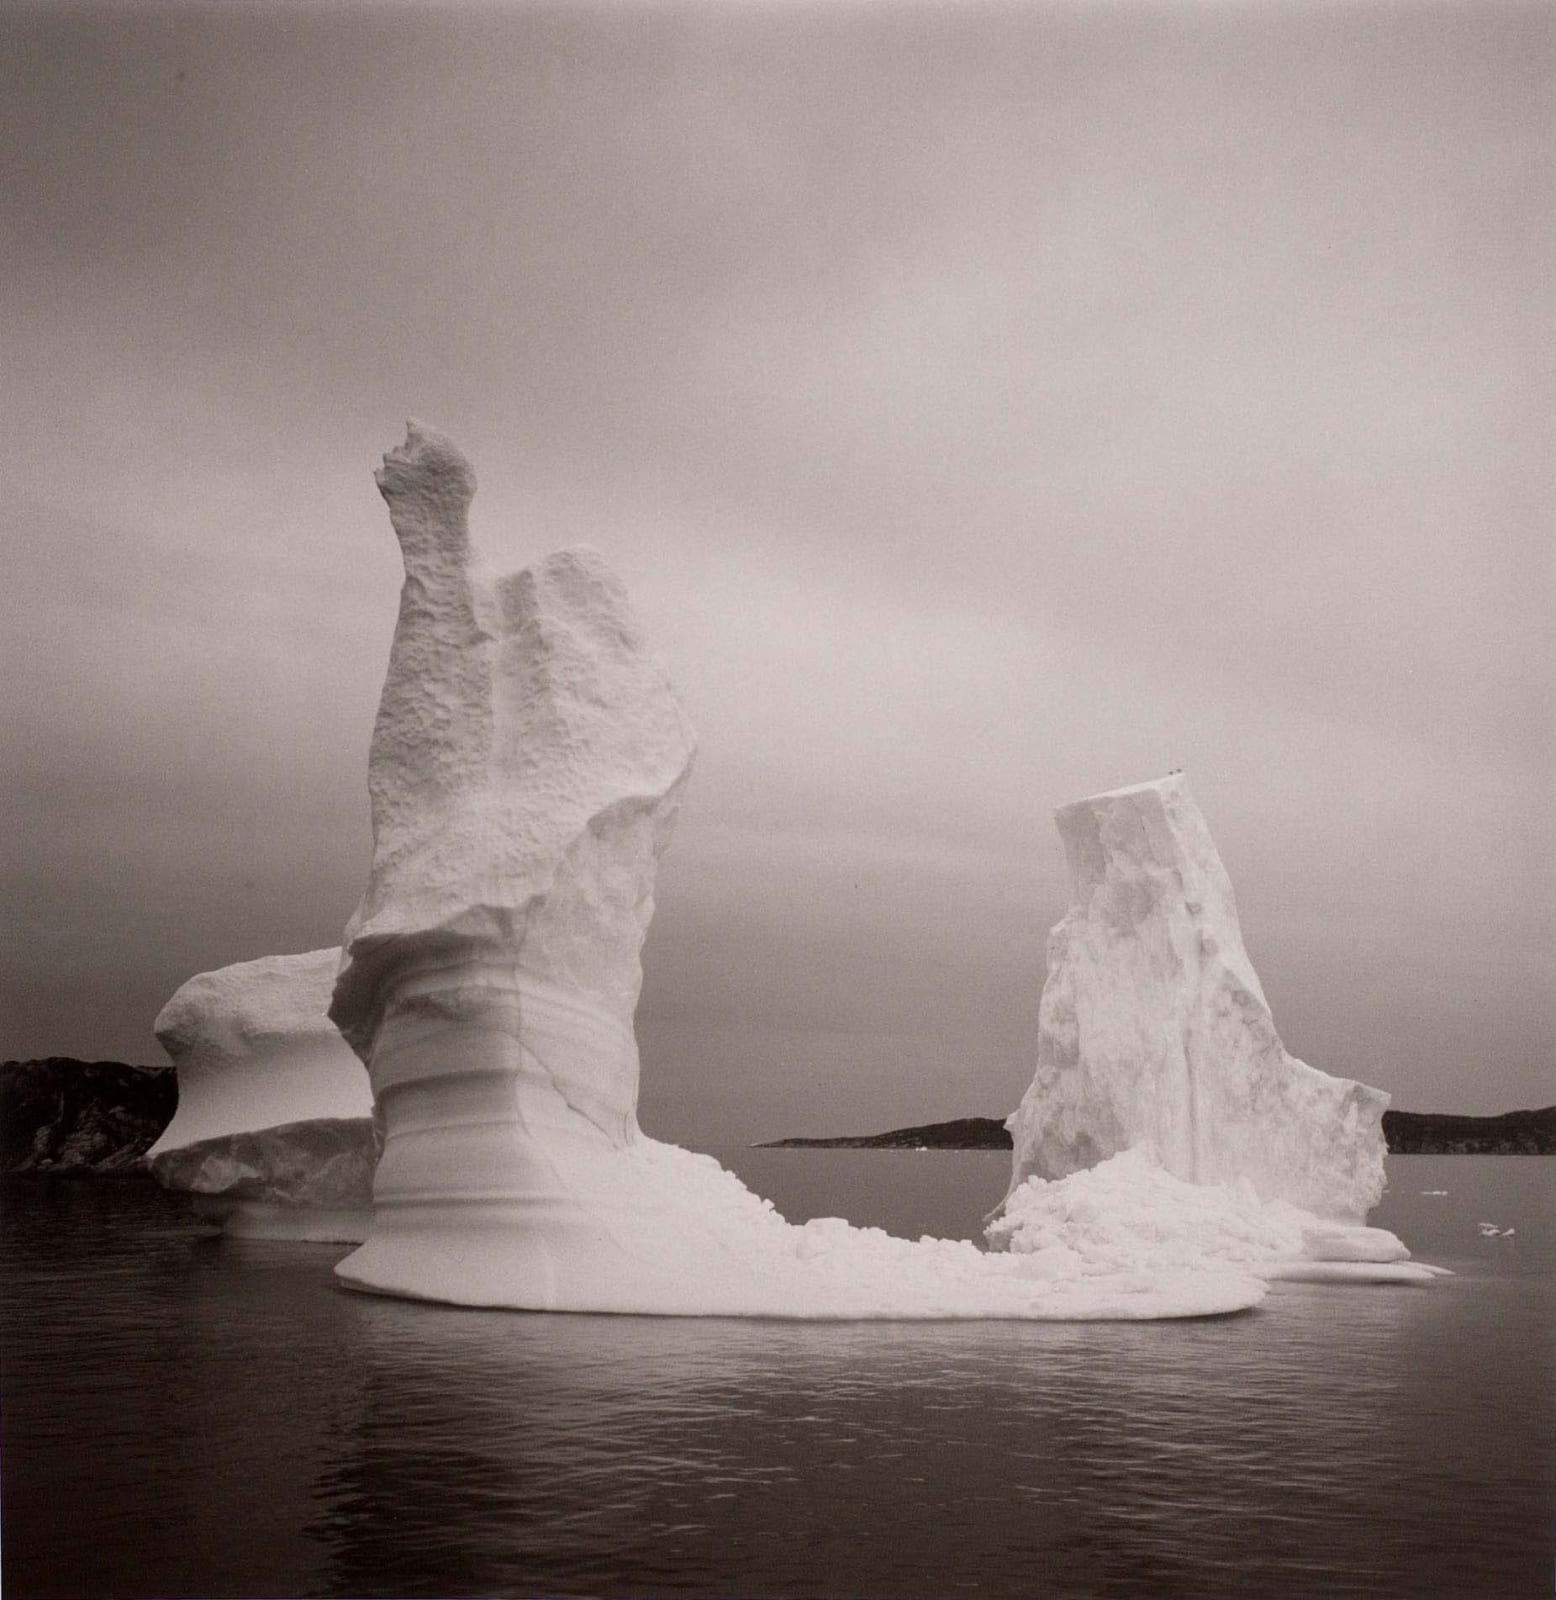 Lynn Davis photograph of icebergs in Disko Bay, Greenland